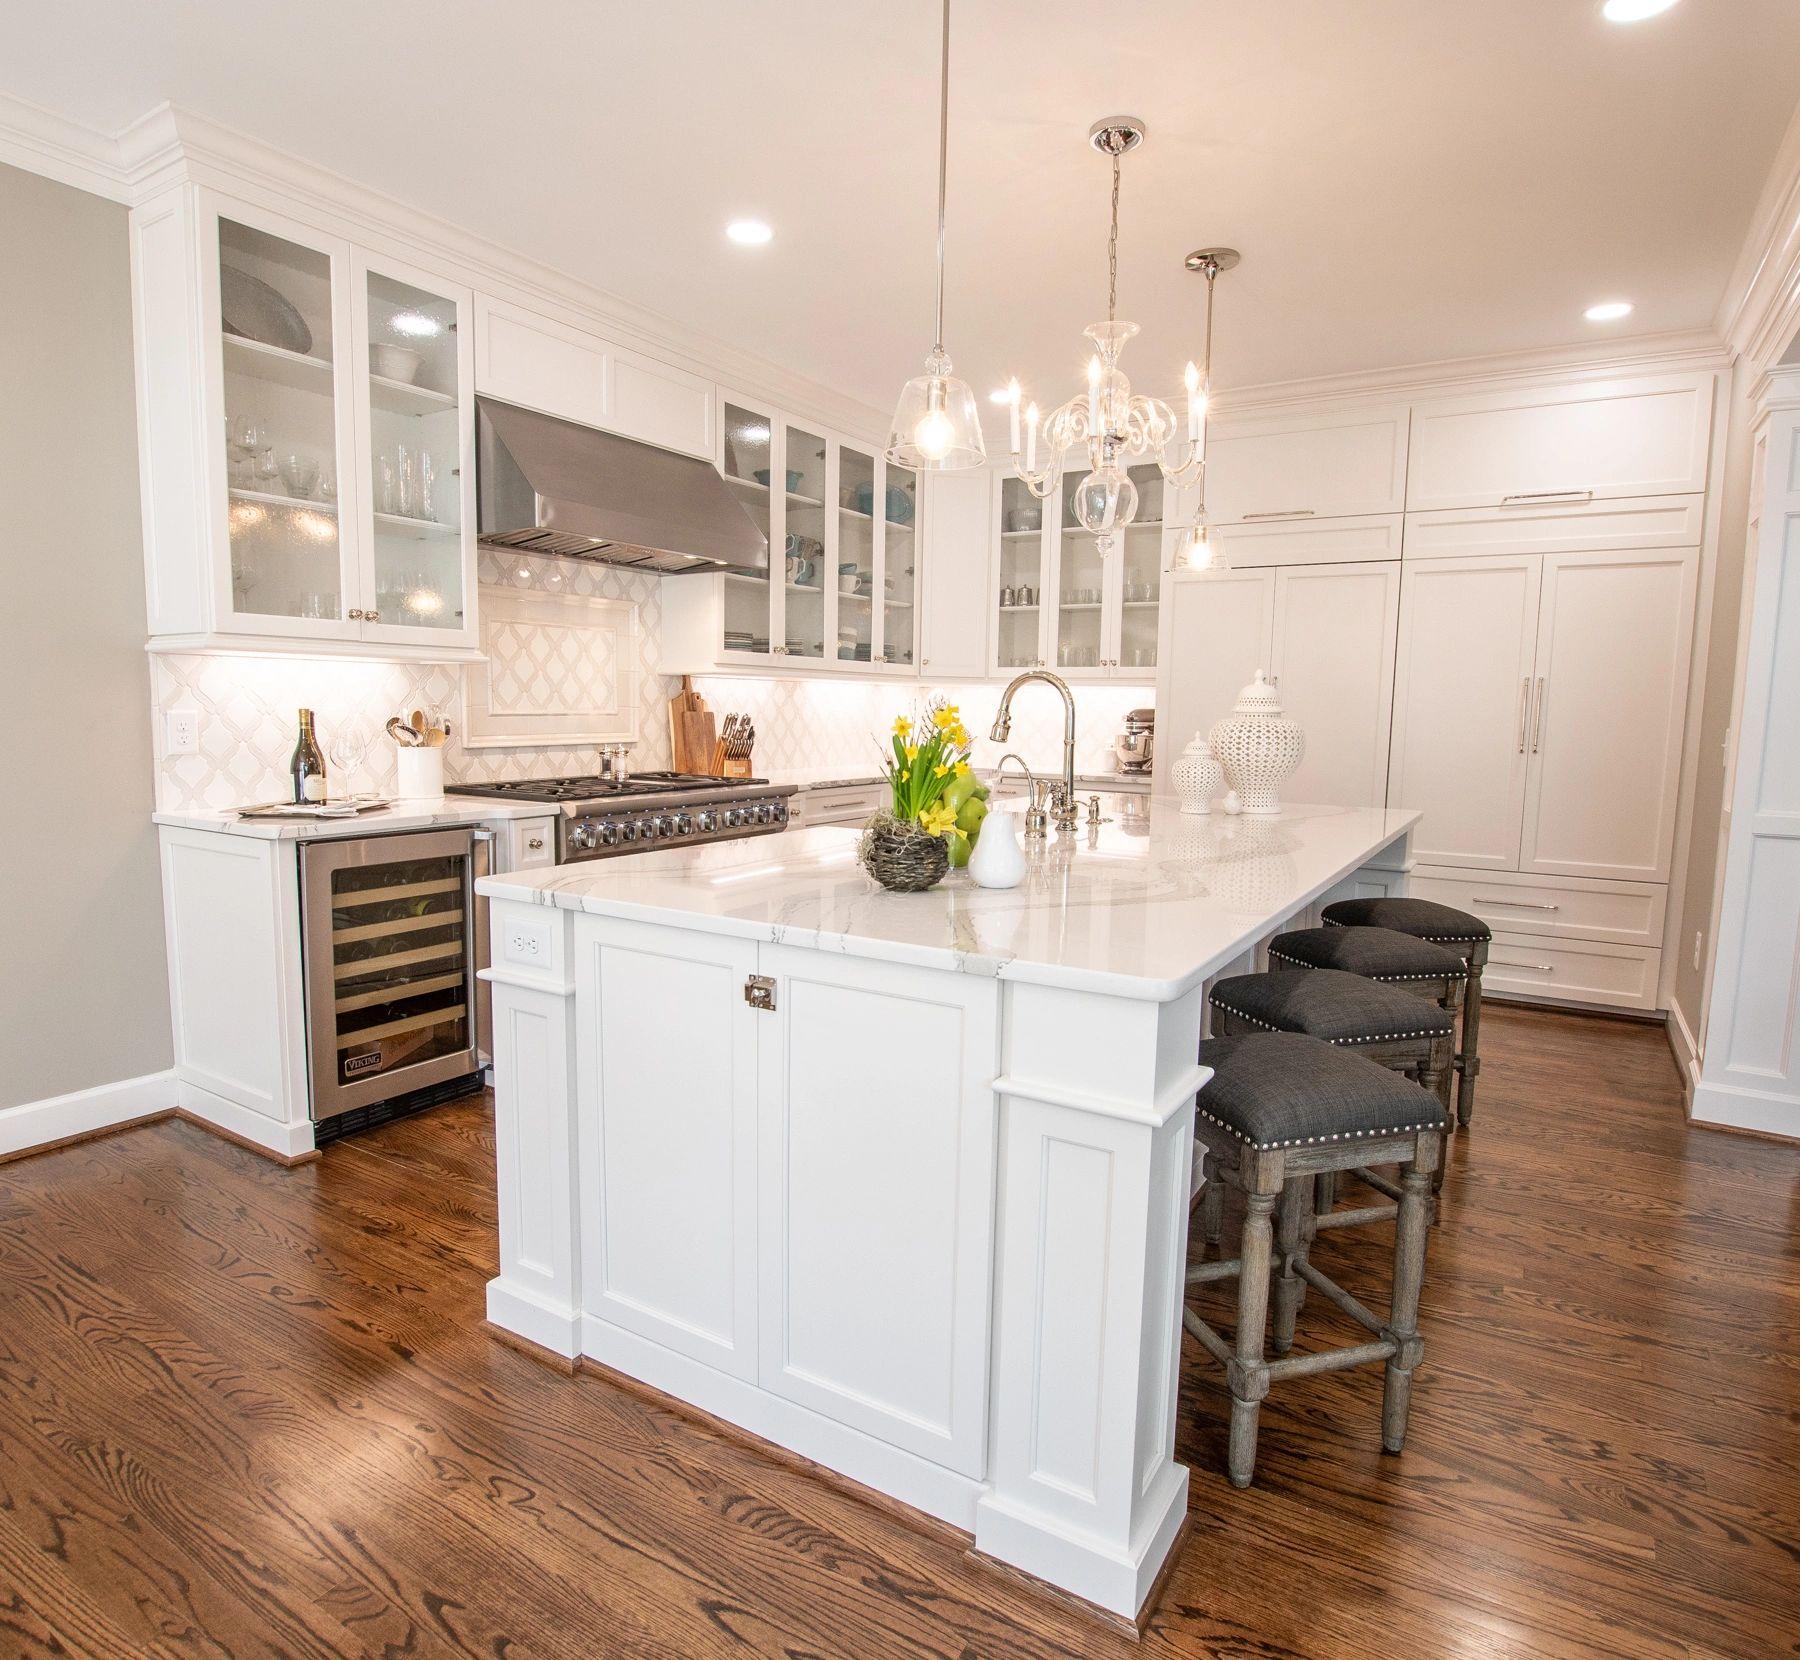 Prestige Kitchen Cabinets: Custom Cabinetry In Williamsburg